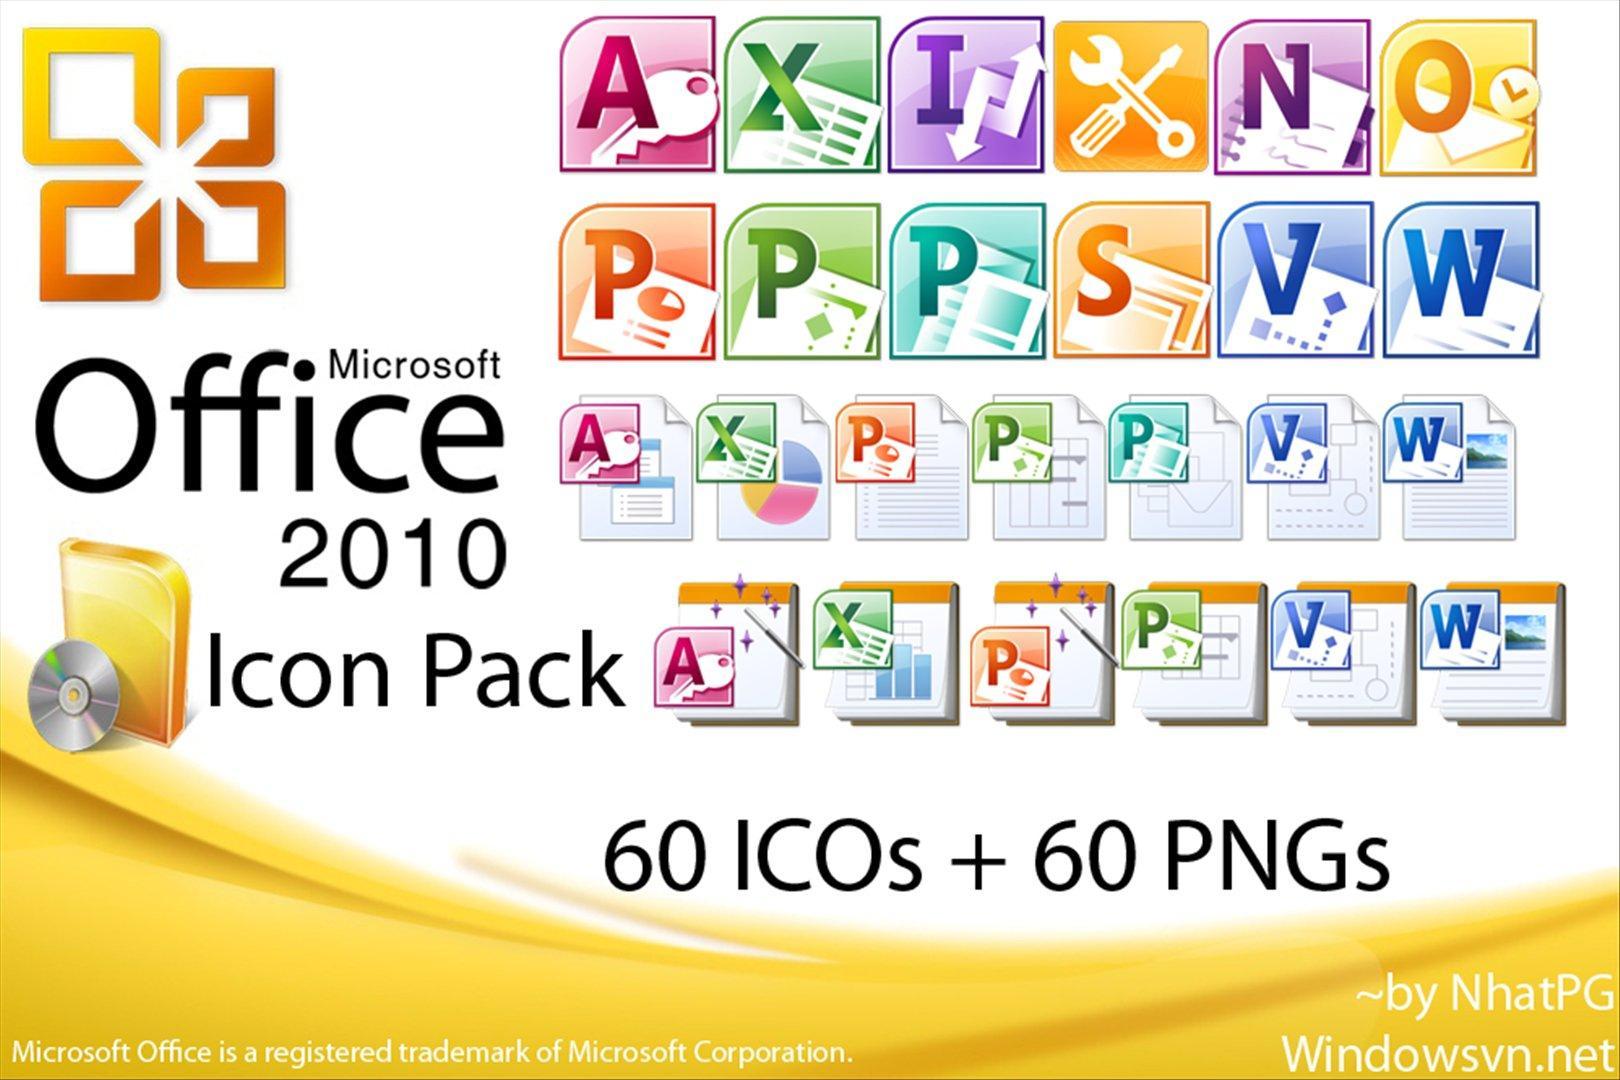 تحميل مجاني لبرنامج  Microsoft Office Professional 2010 عربي وإنجليزي، شامل وورد وإكسل وباور بوينت